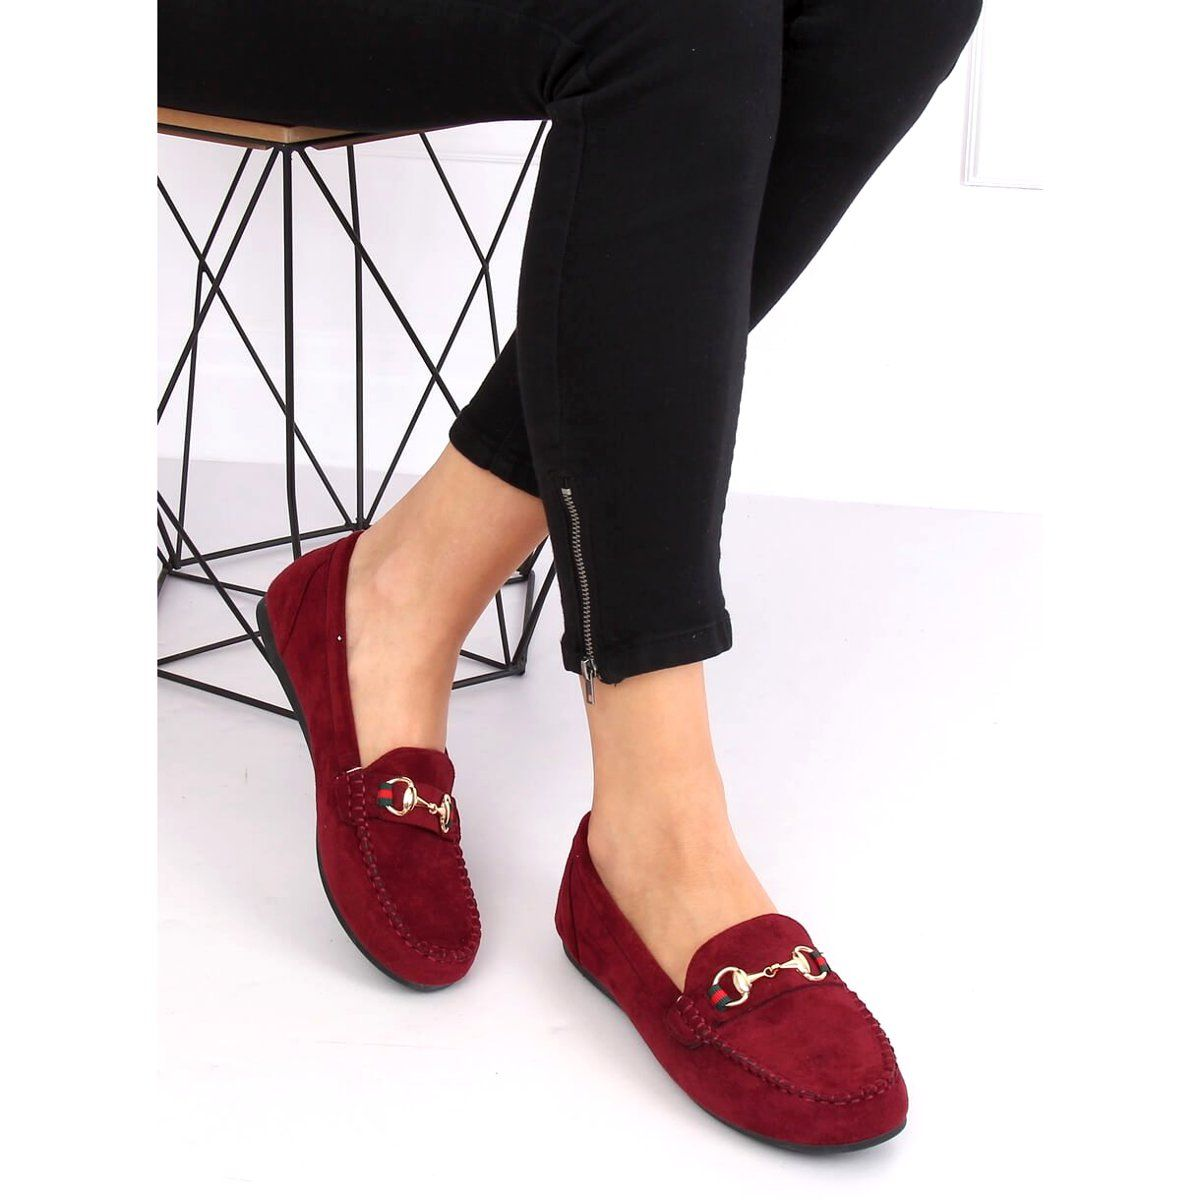 Mokasyny Damskie Bordowe Ch 1m16 Wine Red Czerwone Shoes Mule Shoe Slippers